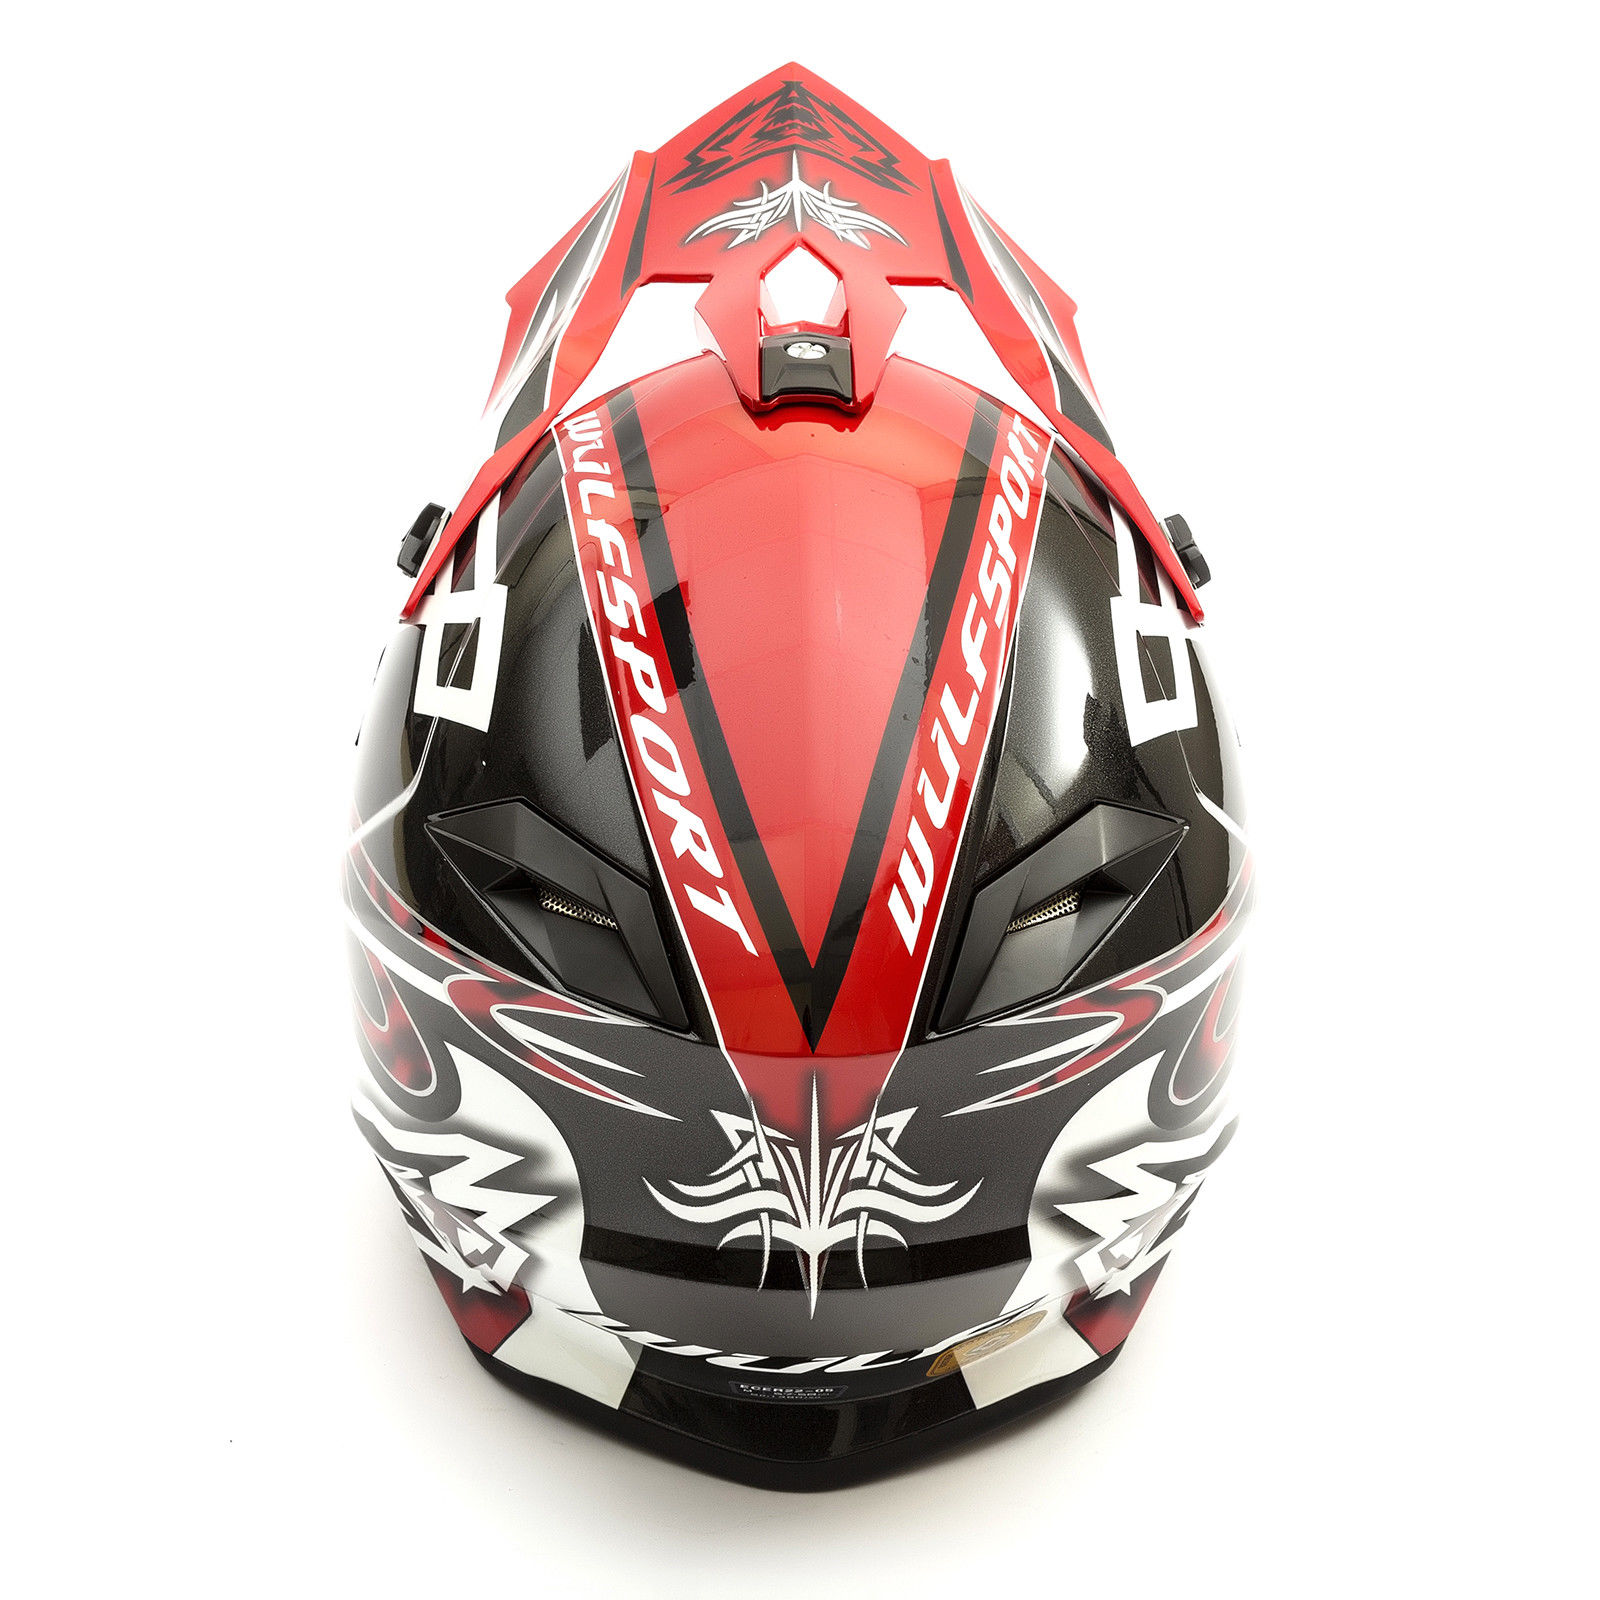 Wulfsport-Adult-Sceptre-Helmets-Motocross-Pitbike-Motorbike-Off-Road-Racing-ATV thumbnail 30